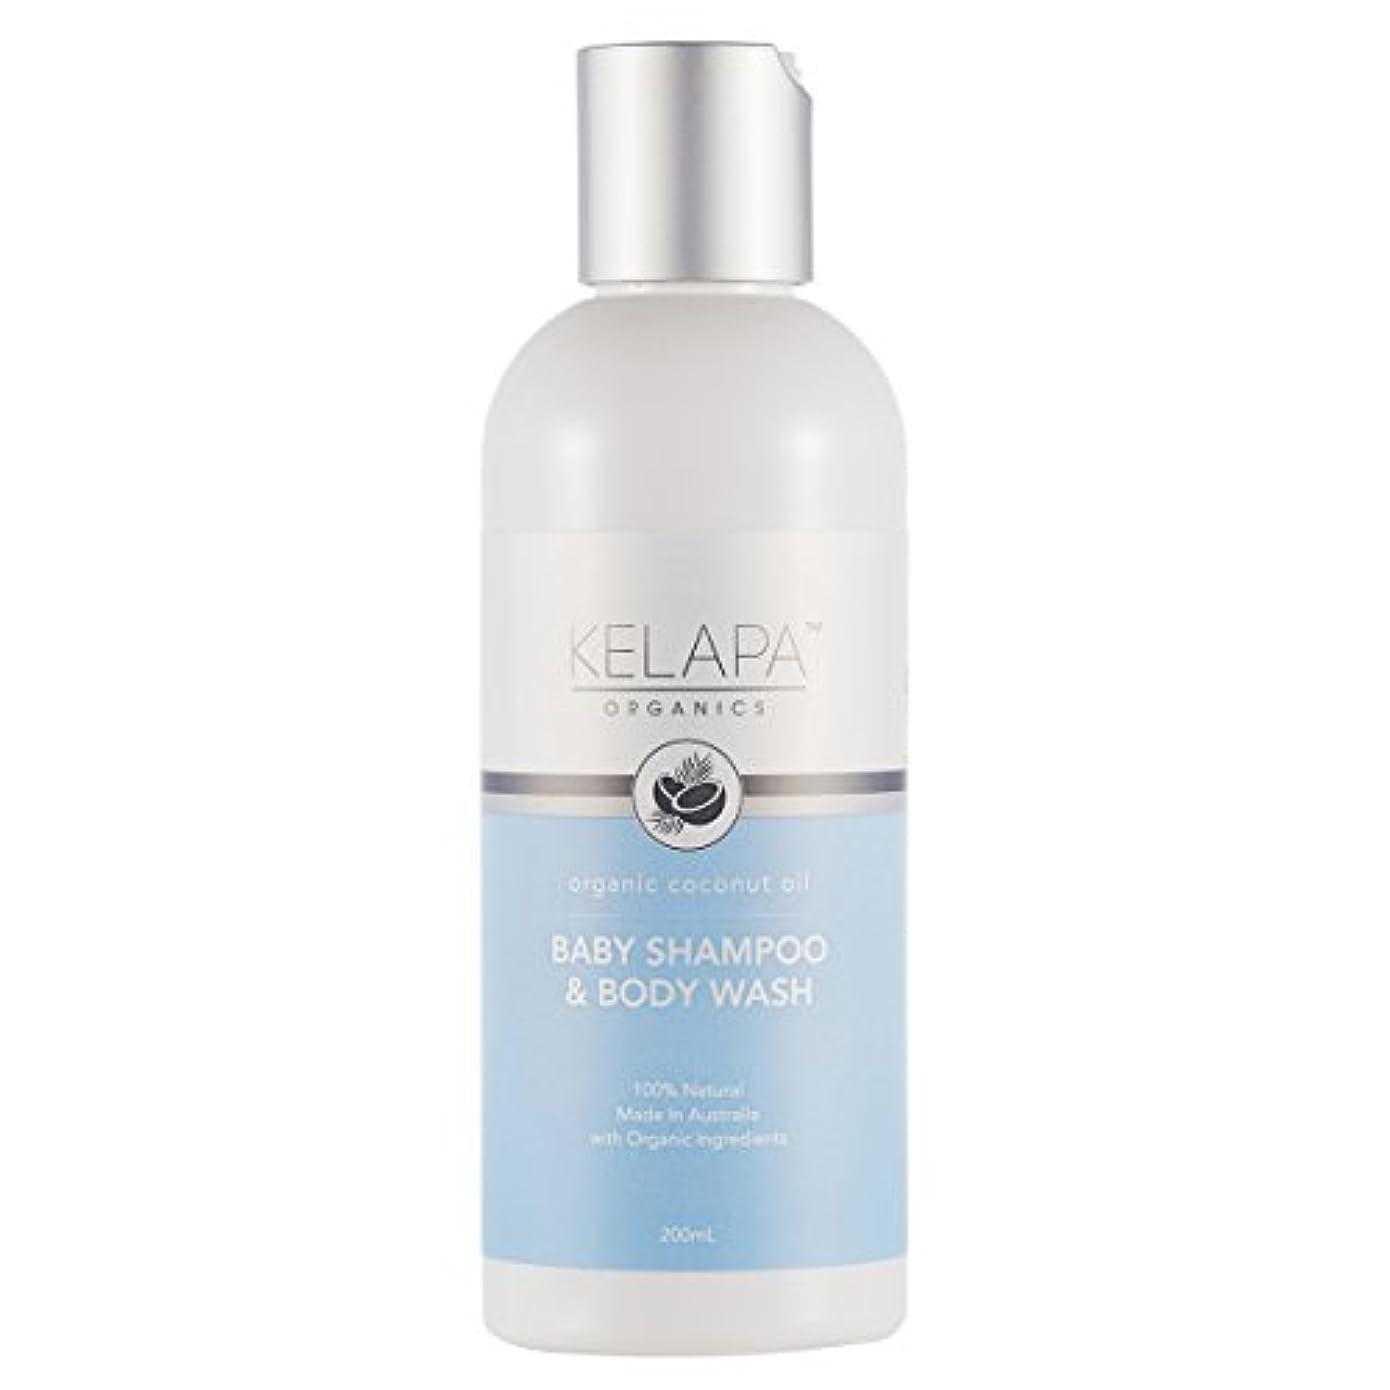 Kelapa Organics Baby Shampoo & Body Wash ベイビーシャンプー&ボディウォッシュ 200ml